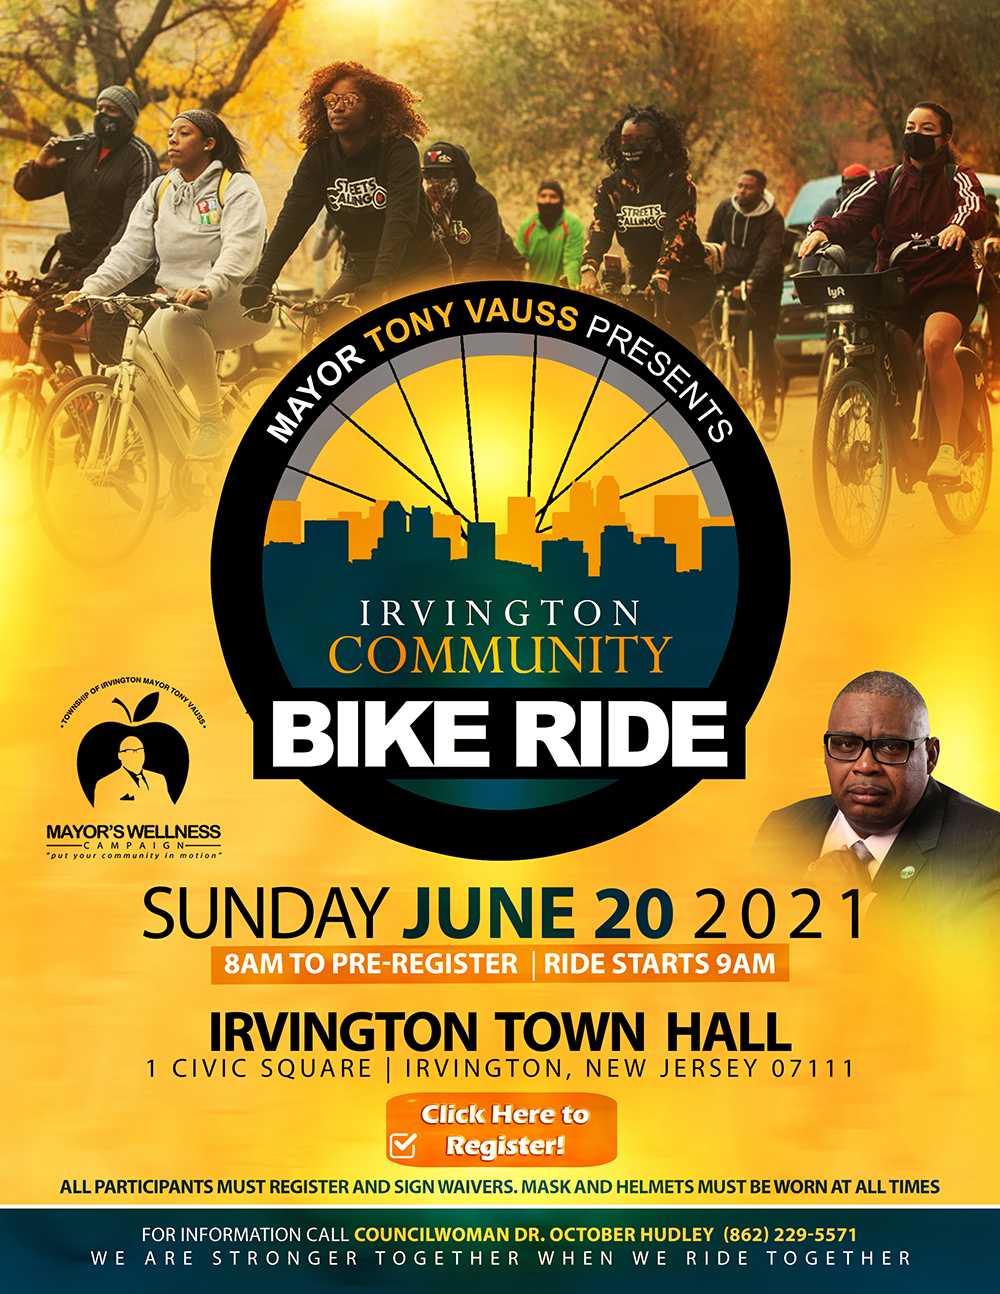 Irvington Bike Ride